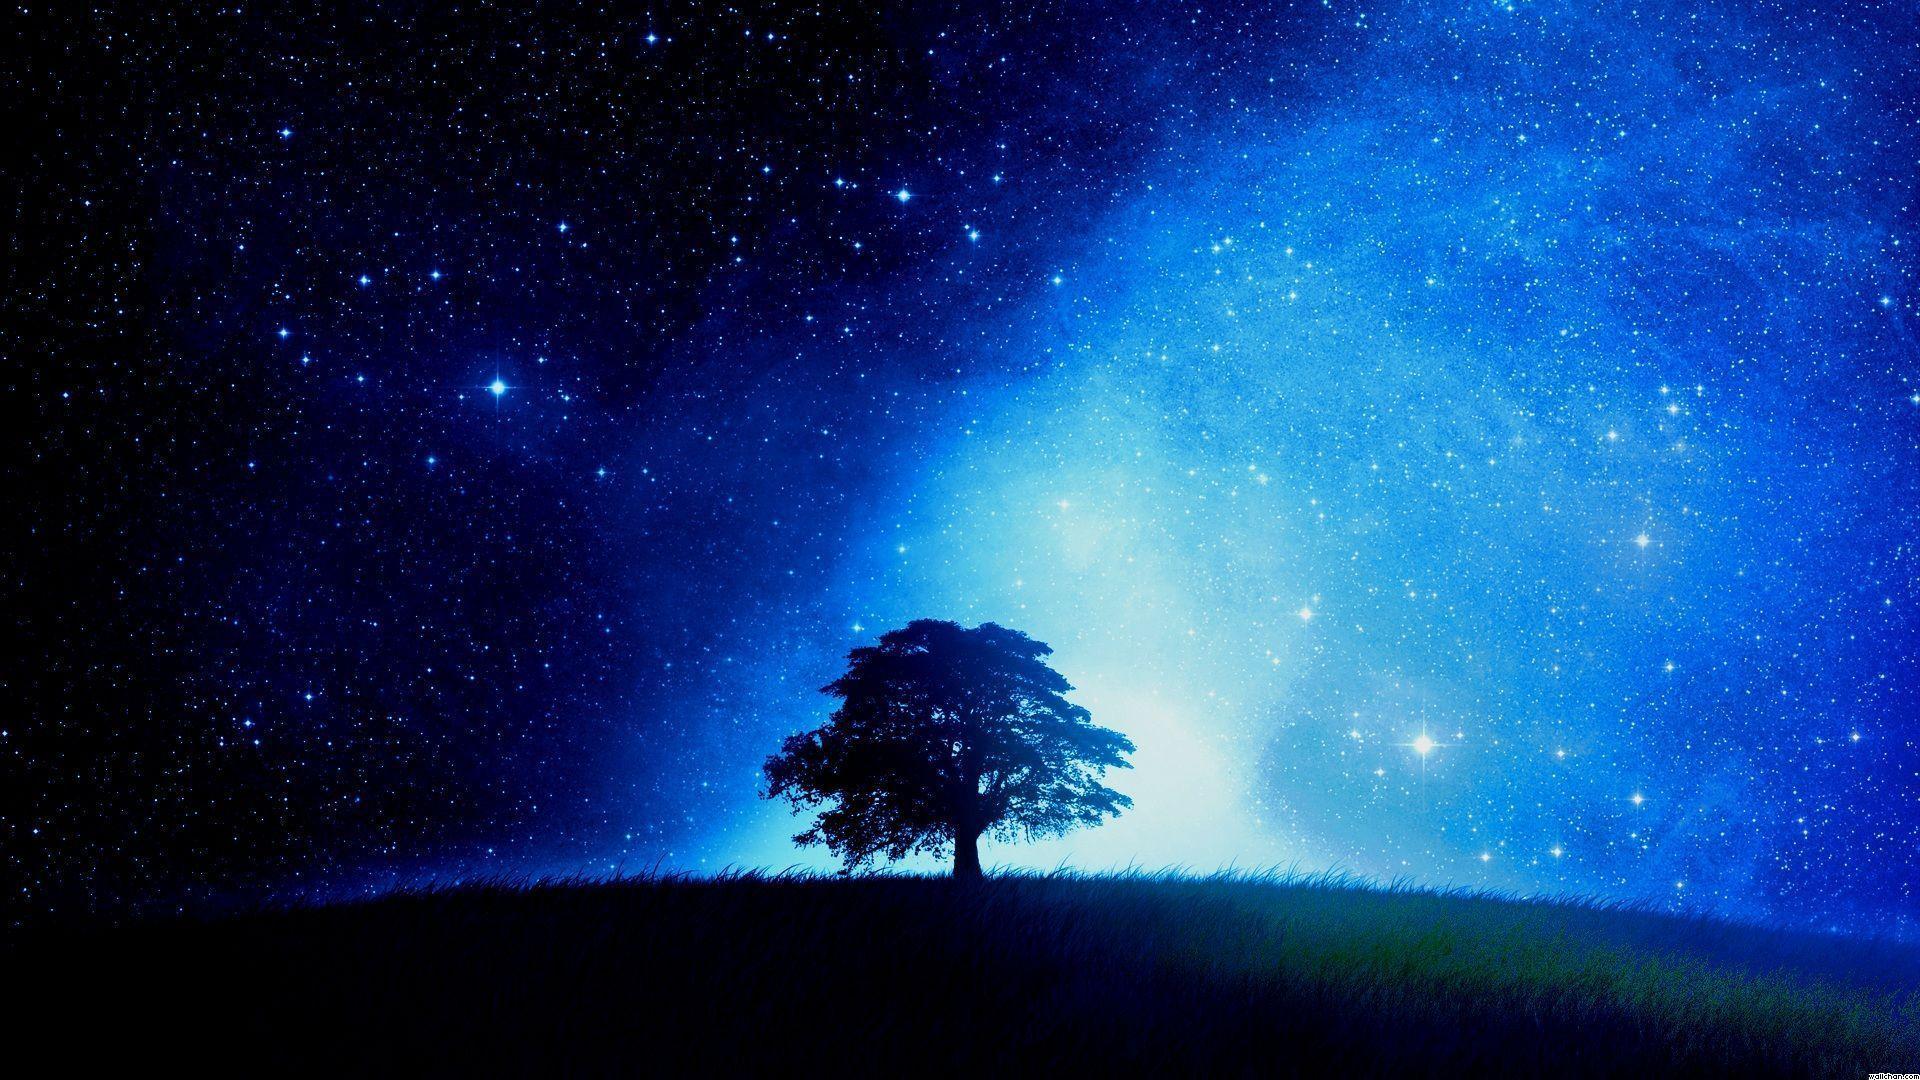 Starry Night Desktop Backgrounds - Wallpaper Cave